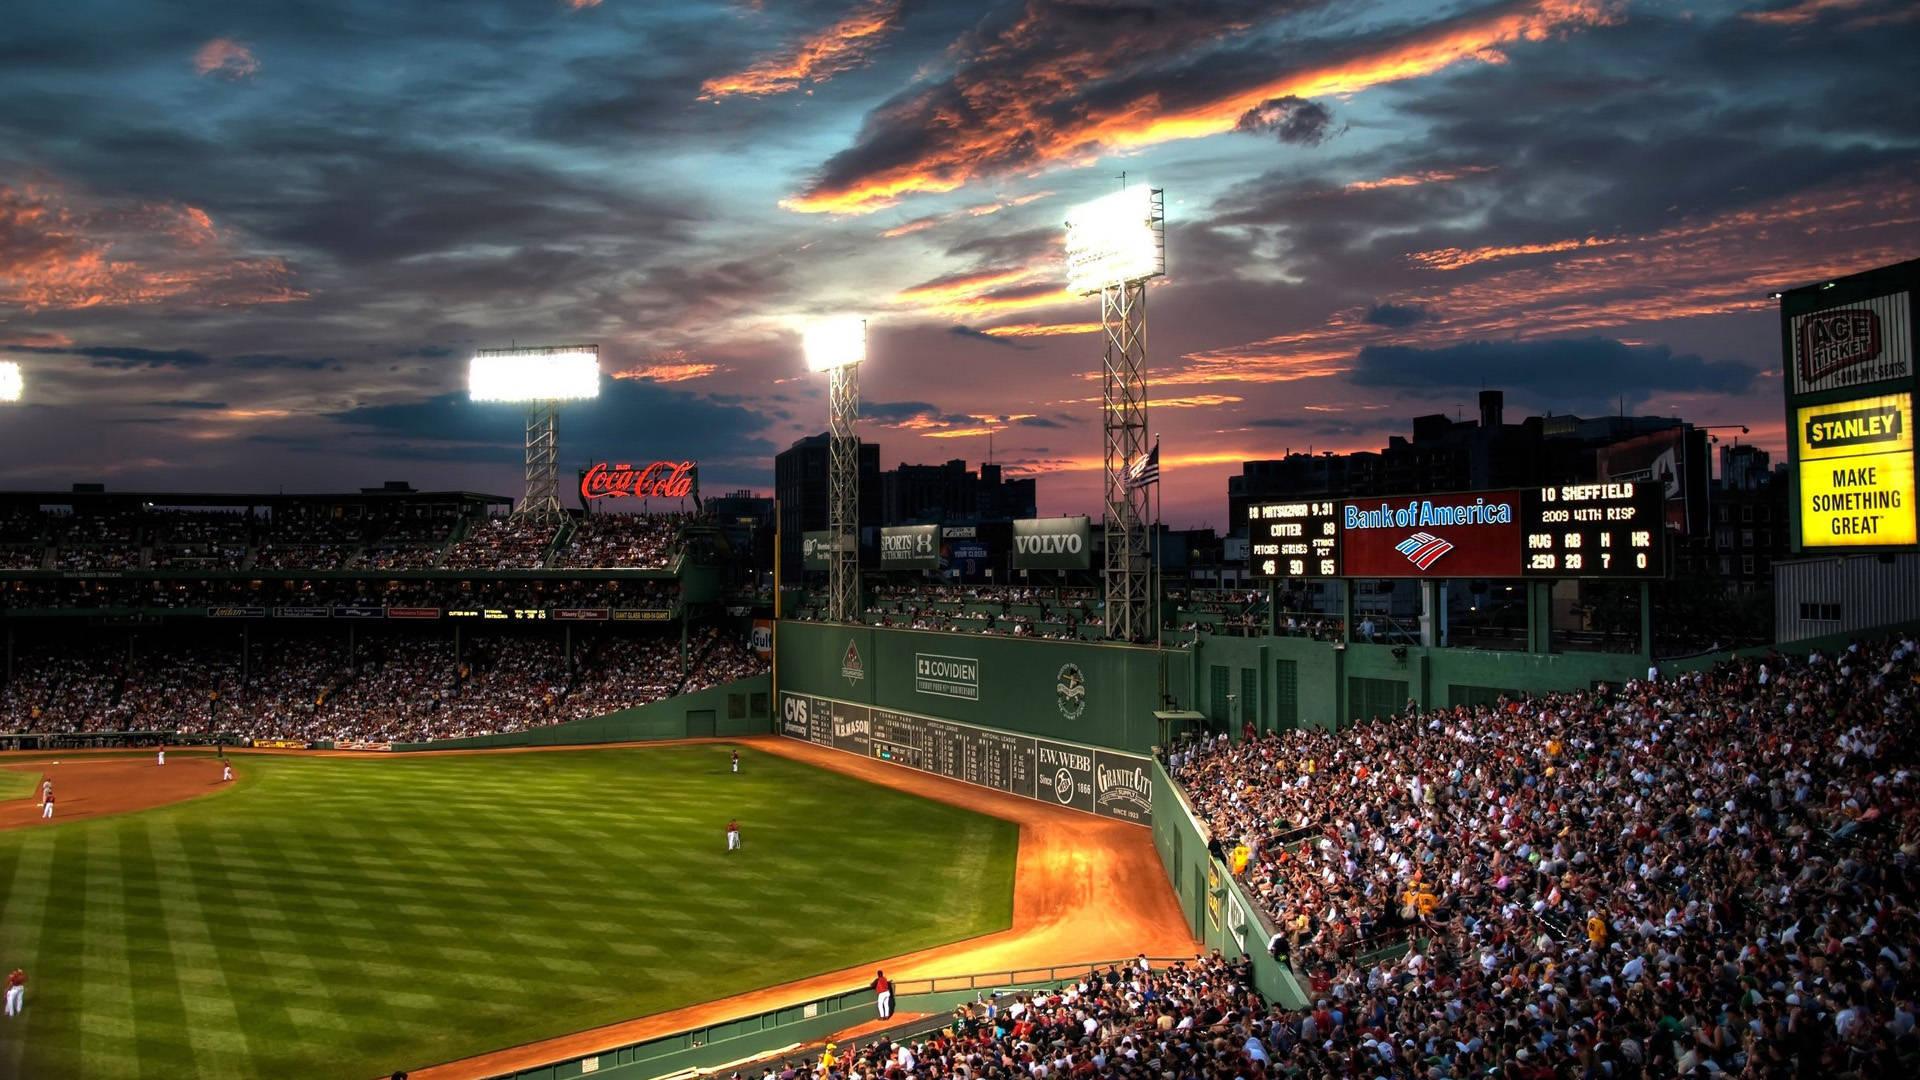 Boston baseball field wallpaper city wallpaper 1920x1080